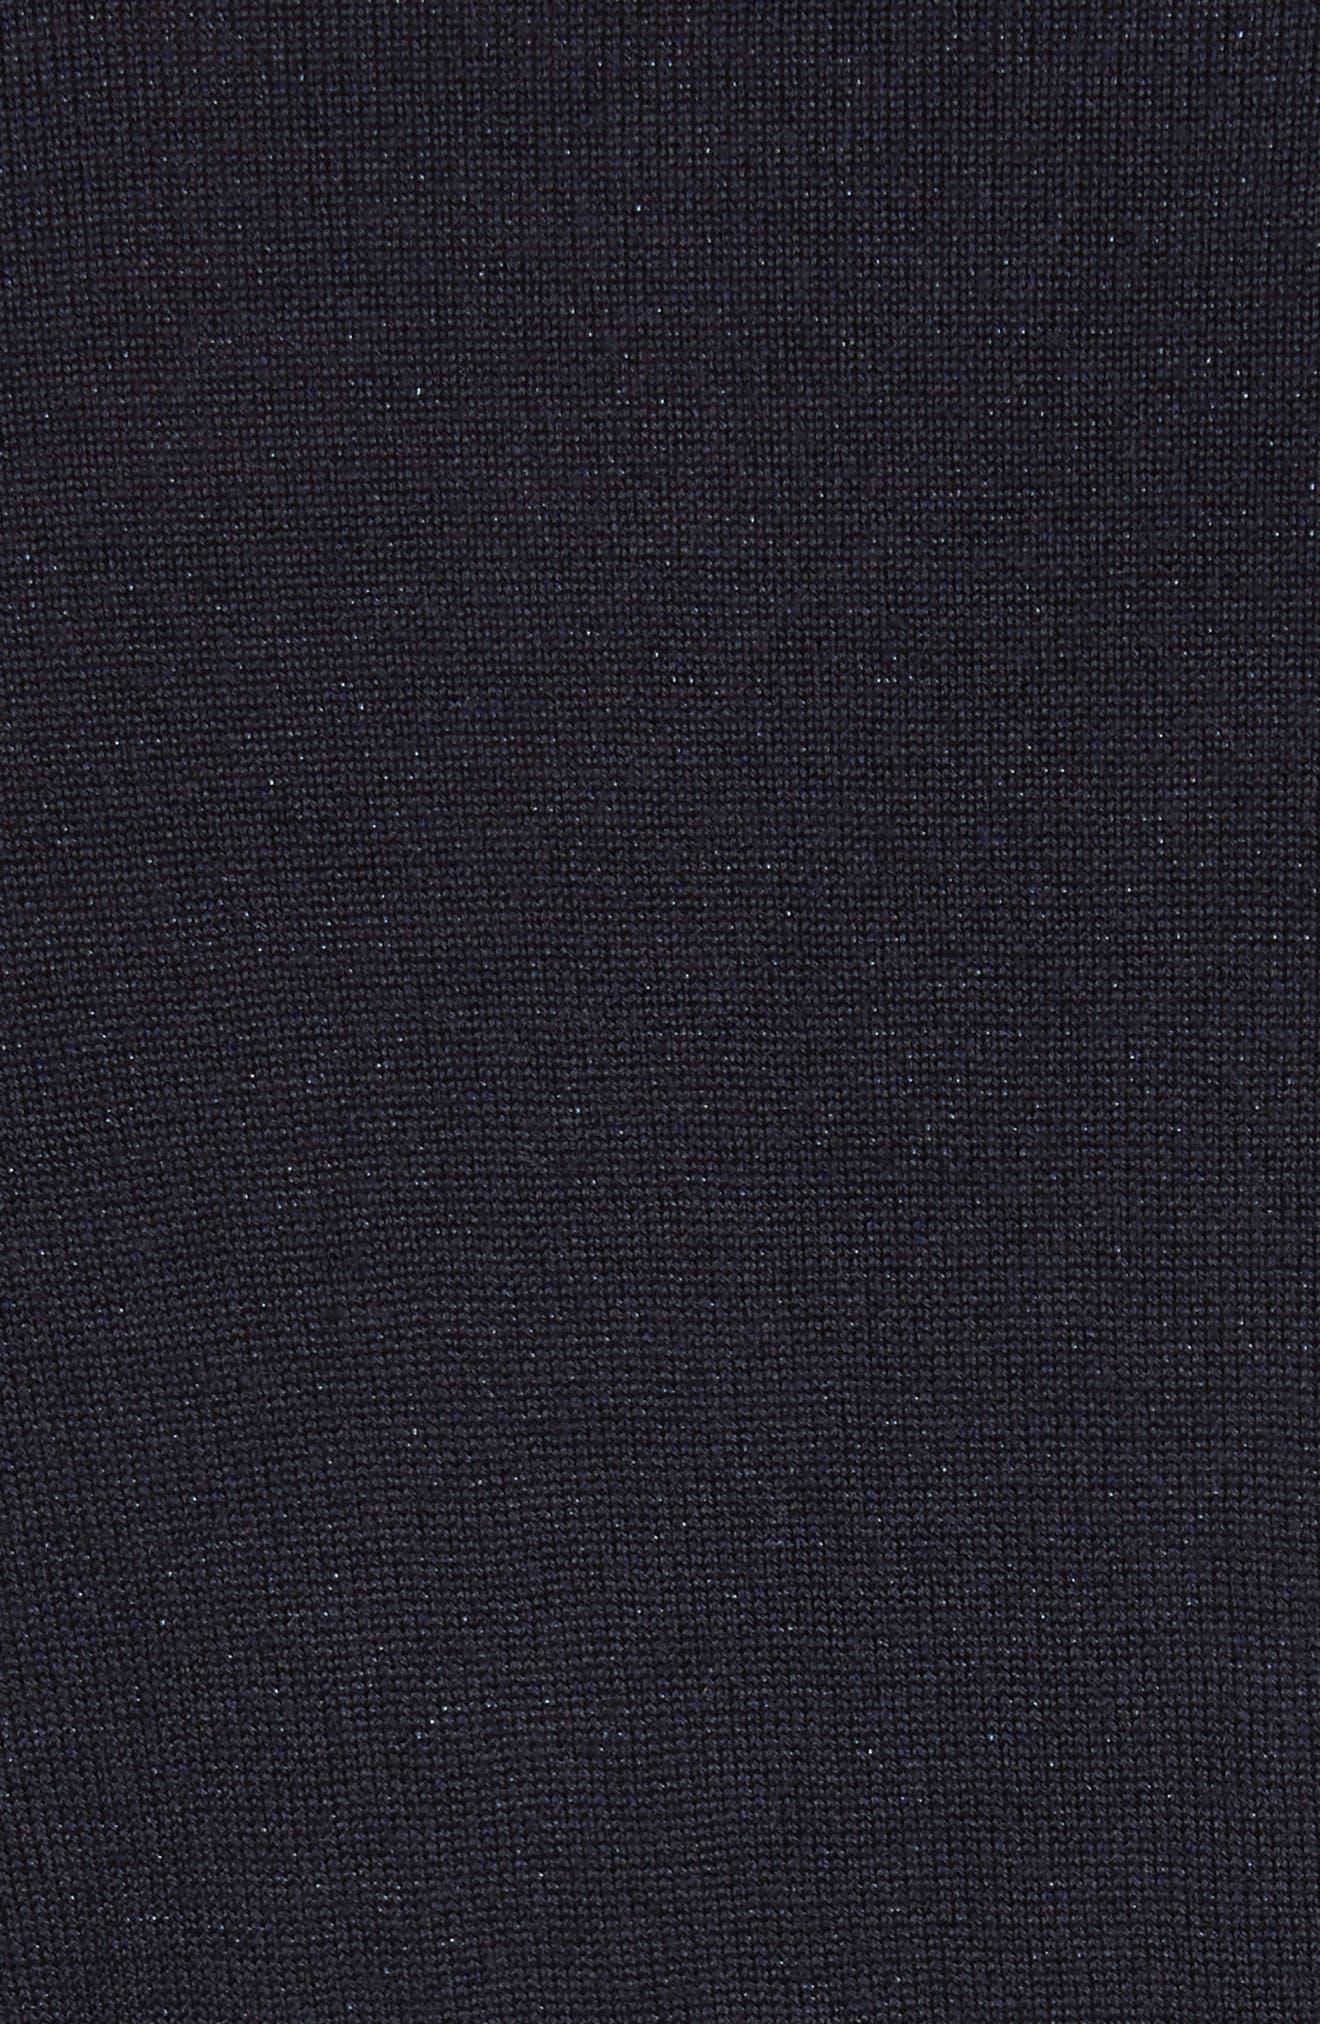 AJ V-Neck Sweater,                             Alternate thumbnail 5, color,